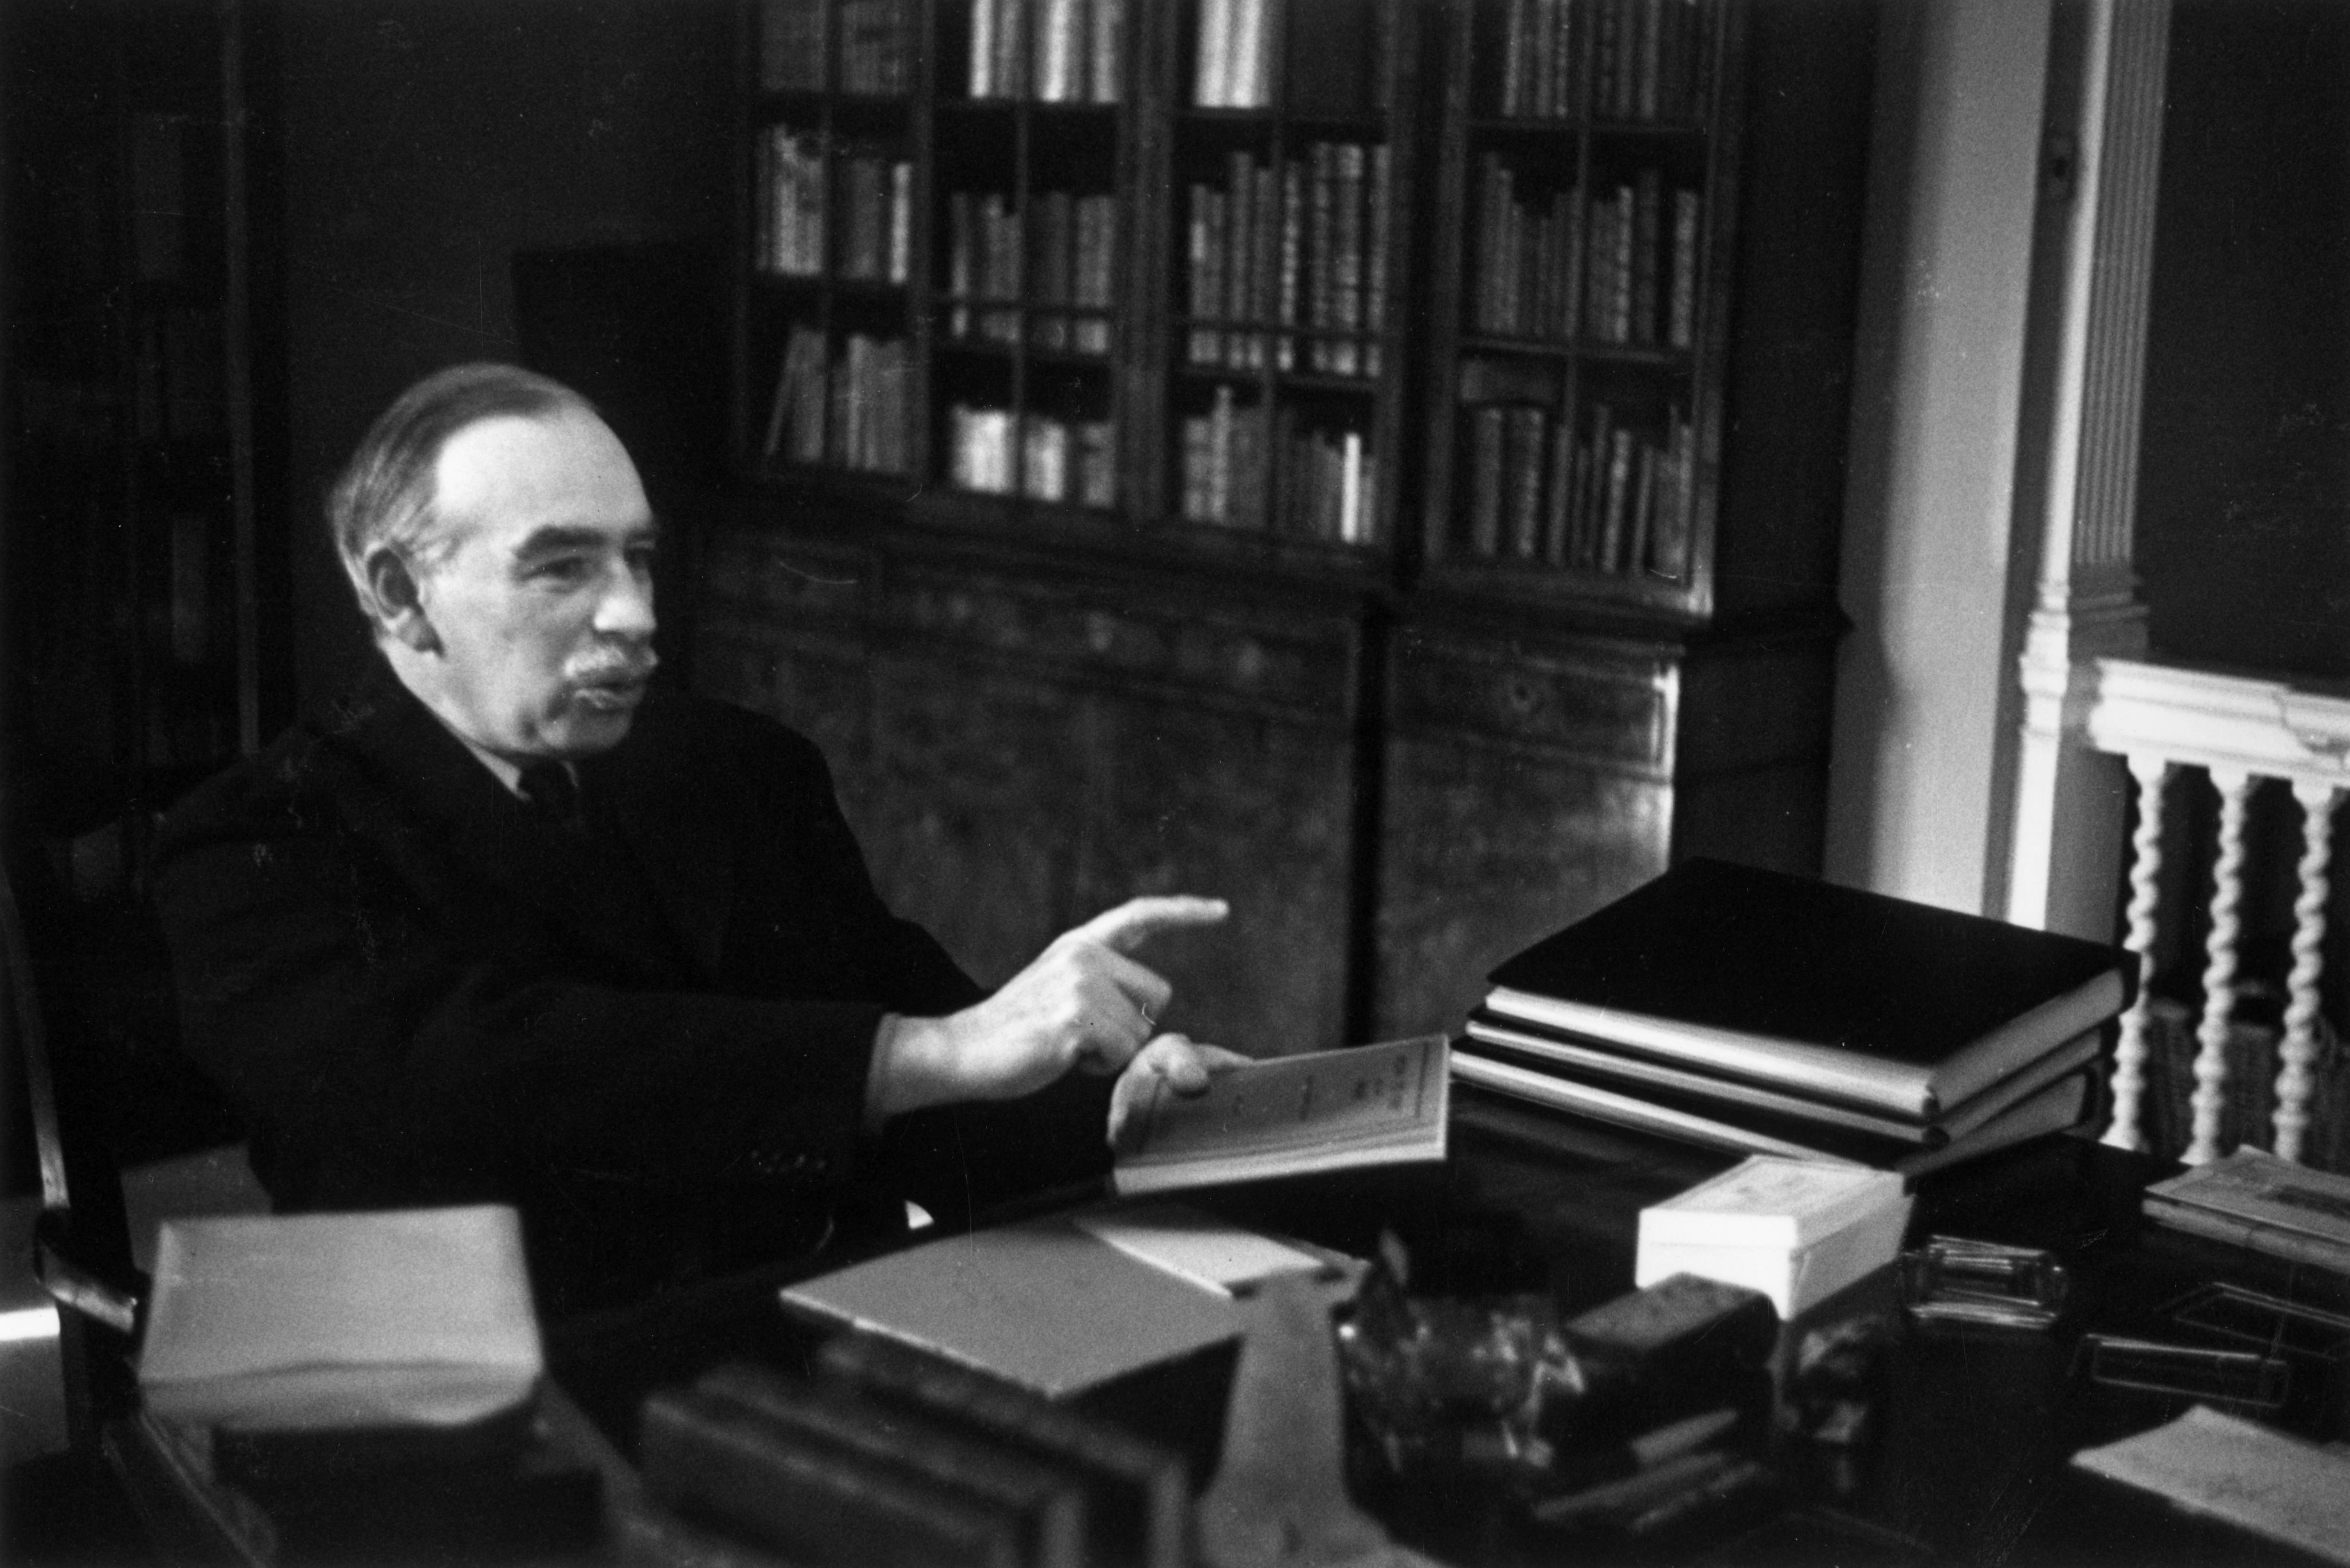 John Maynard Keynes on the stock market this past week | PBS NewsHour